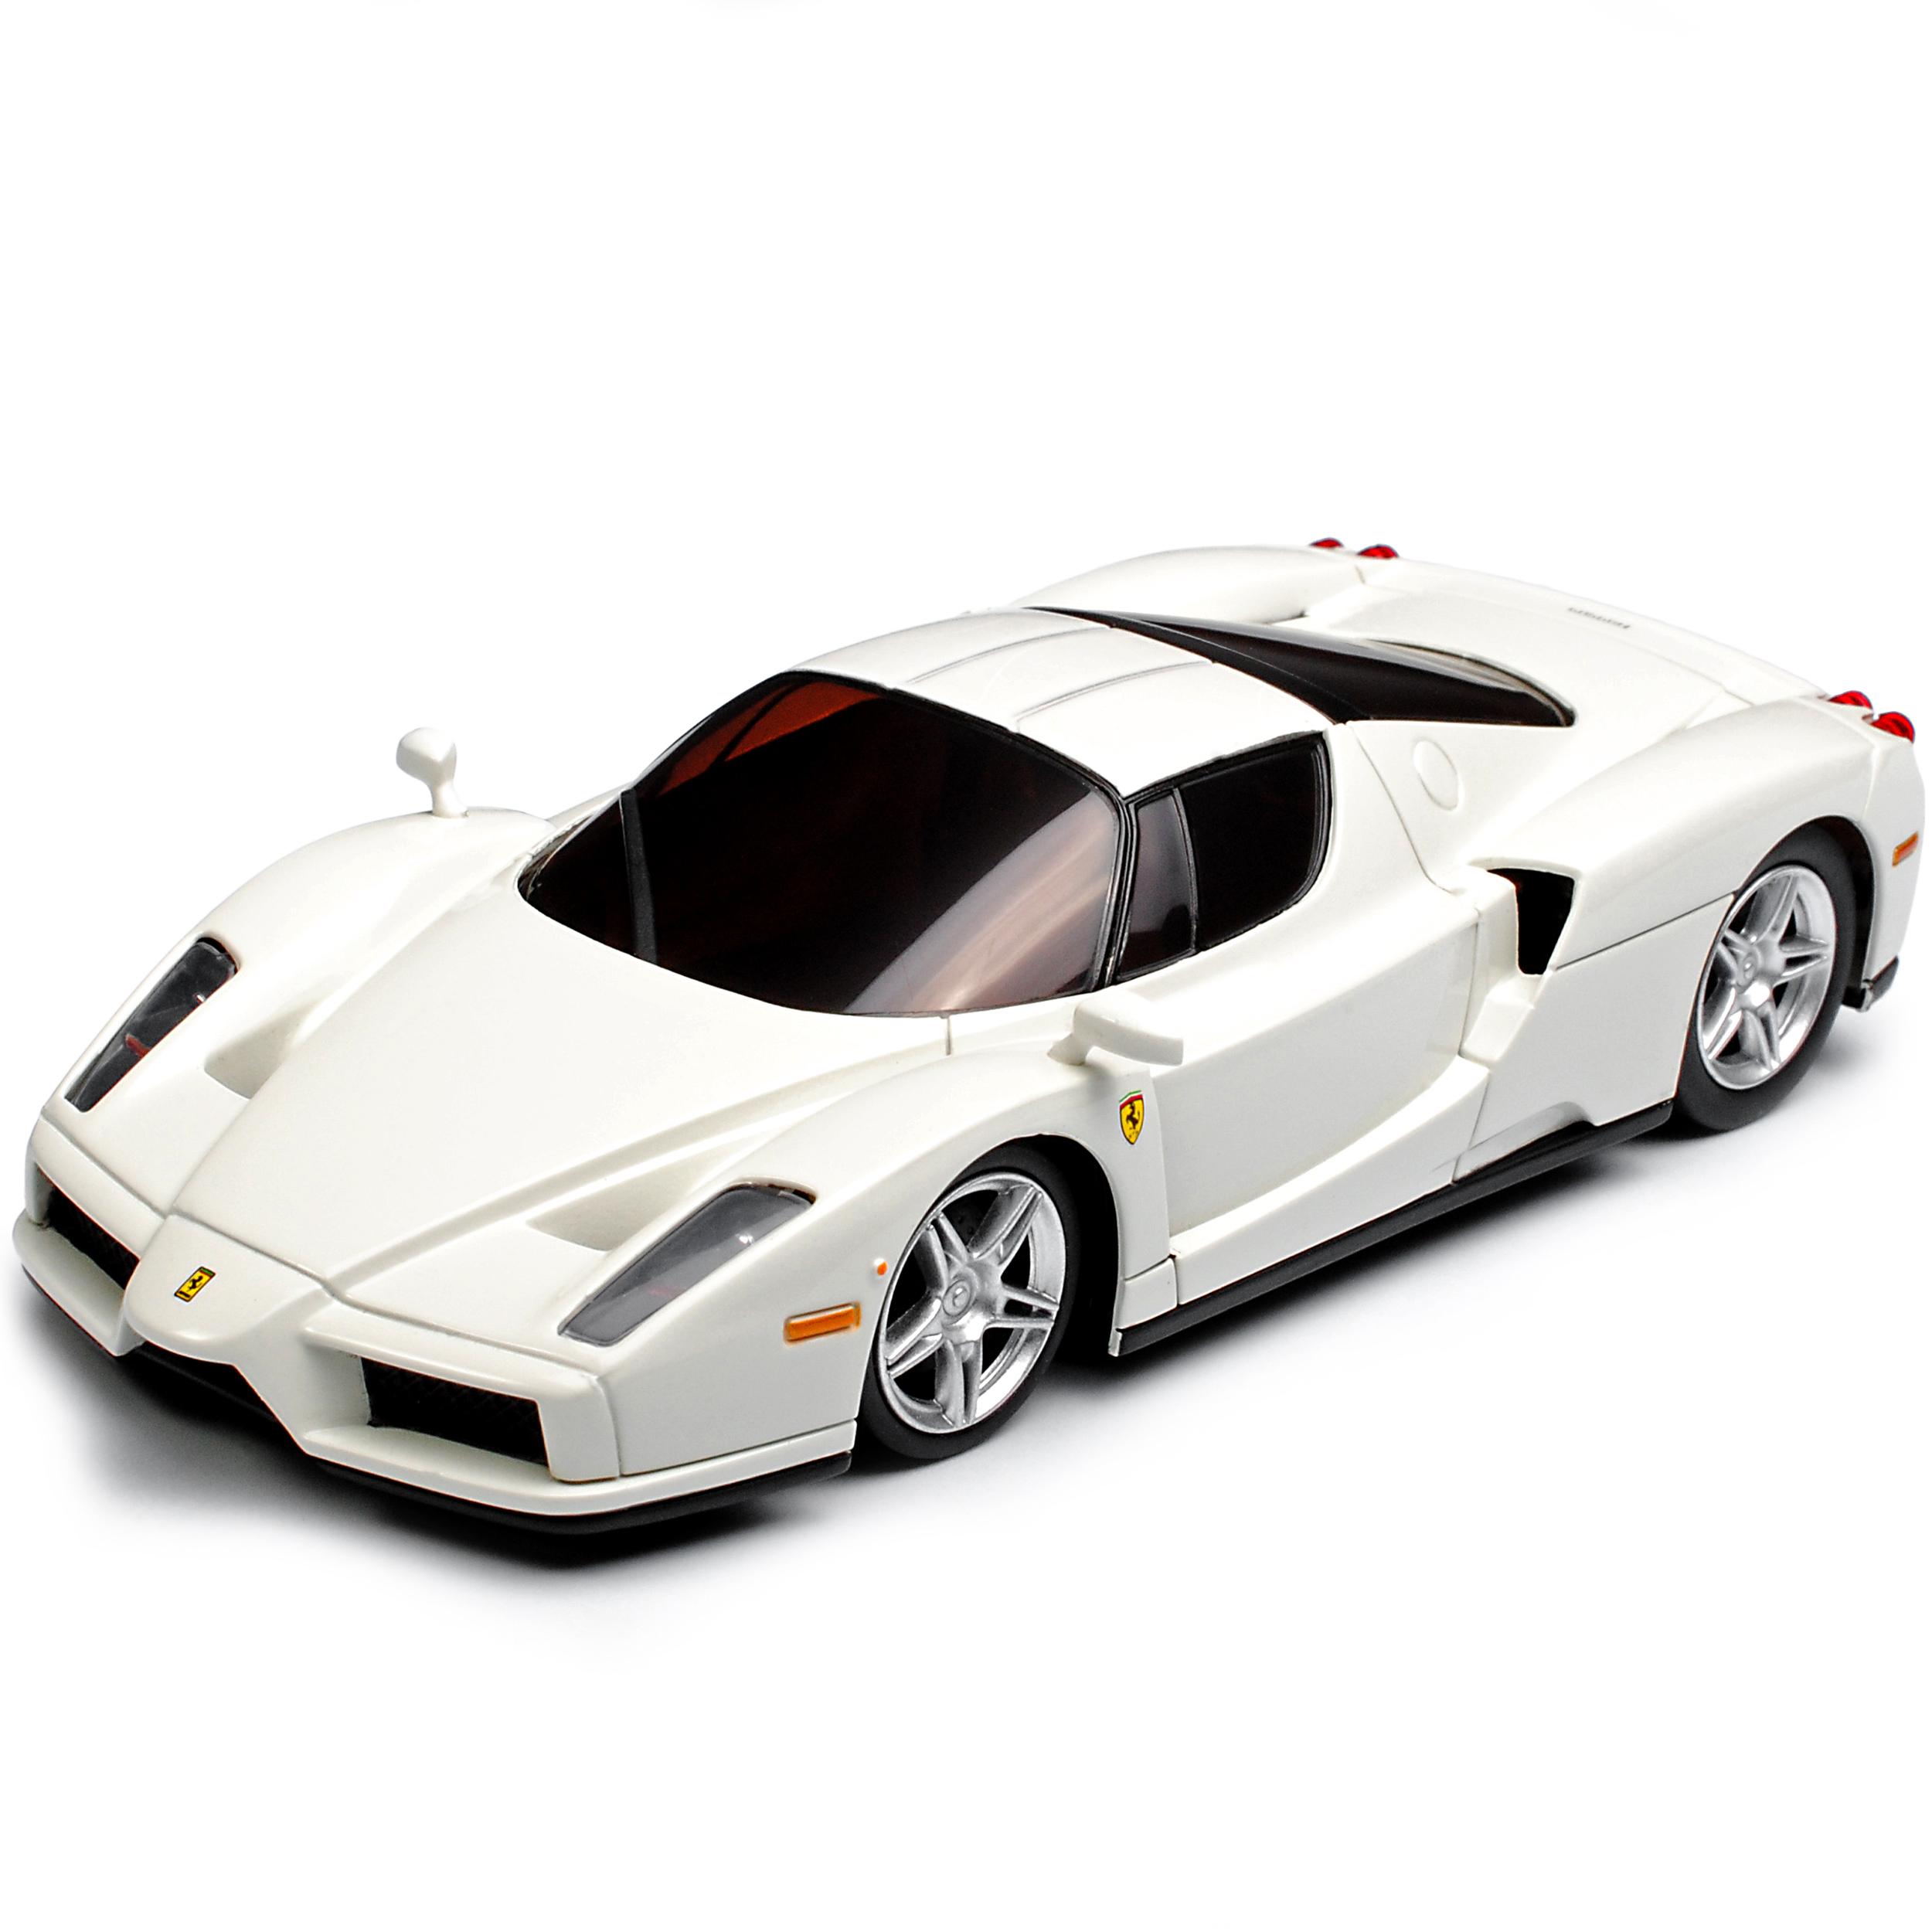 Ferrari Enzo Coupe Weiss 2002-2004 1//43 Kyosho Modell Auto mit oder ohne indiv..